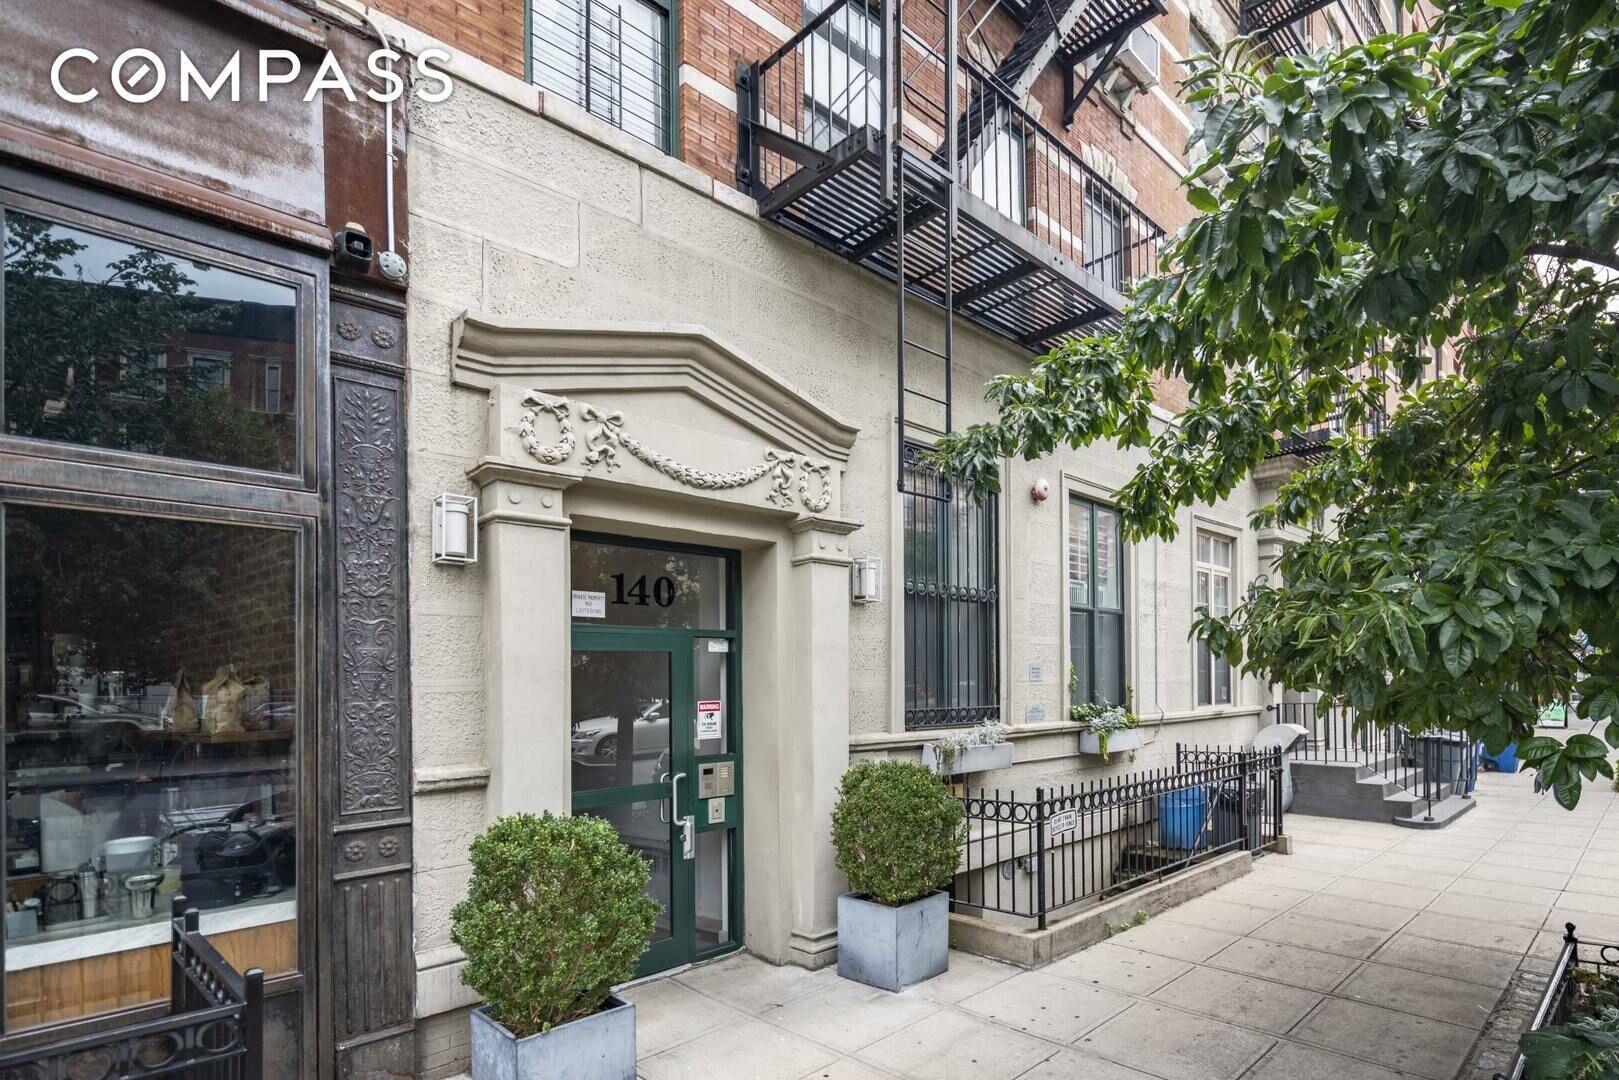 Apartment for sale at 140 Edgecombe Avenue, Apt 1